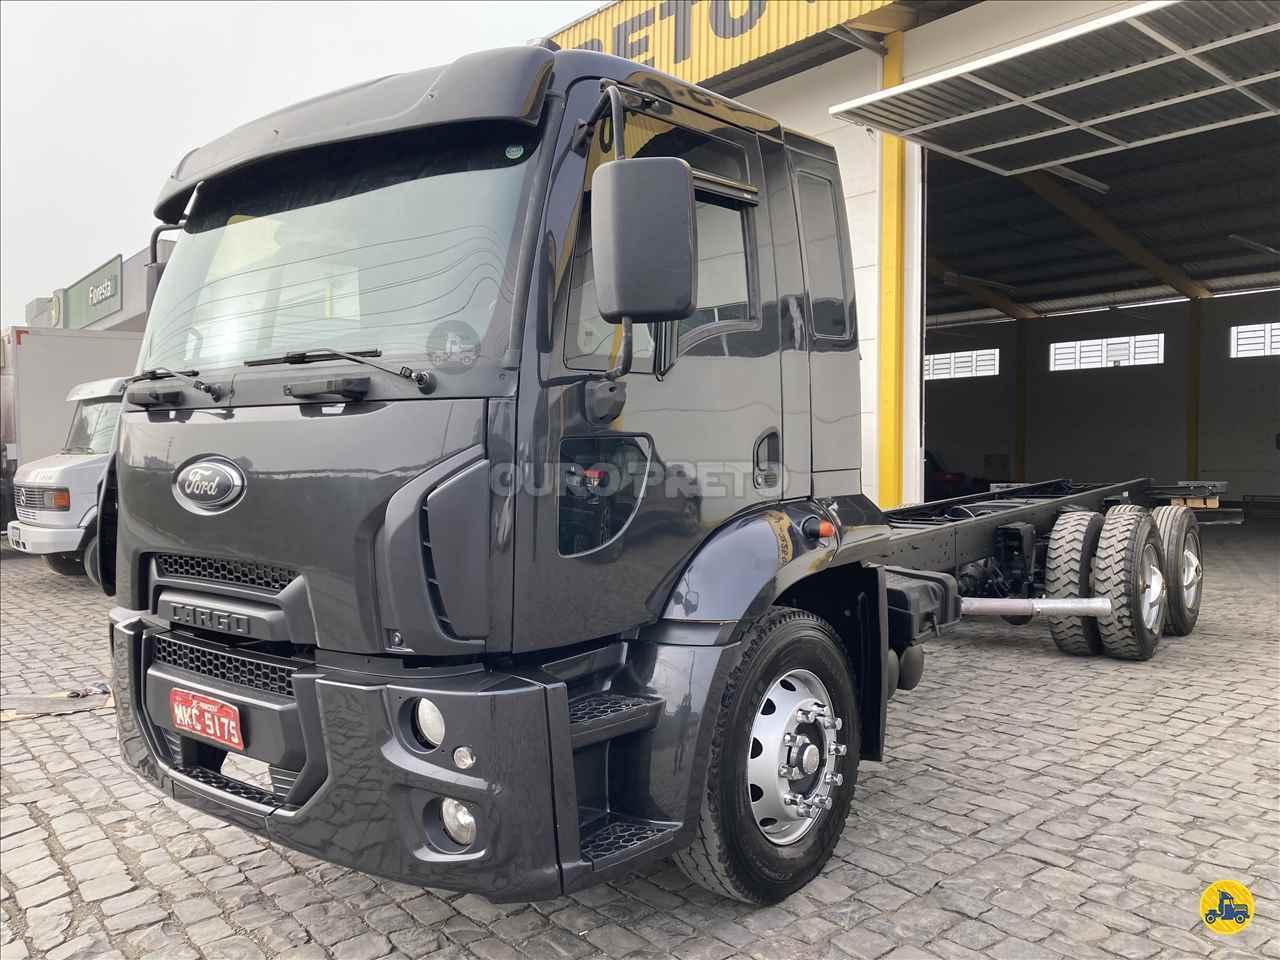 CAMINHAO FORD CARGO 1723 Chassis Truck 6x2 Ouro Preto Caminhões LAGES SANTA CATARINA SC